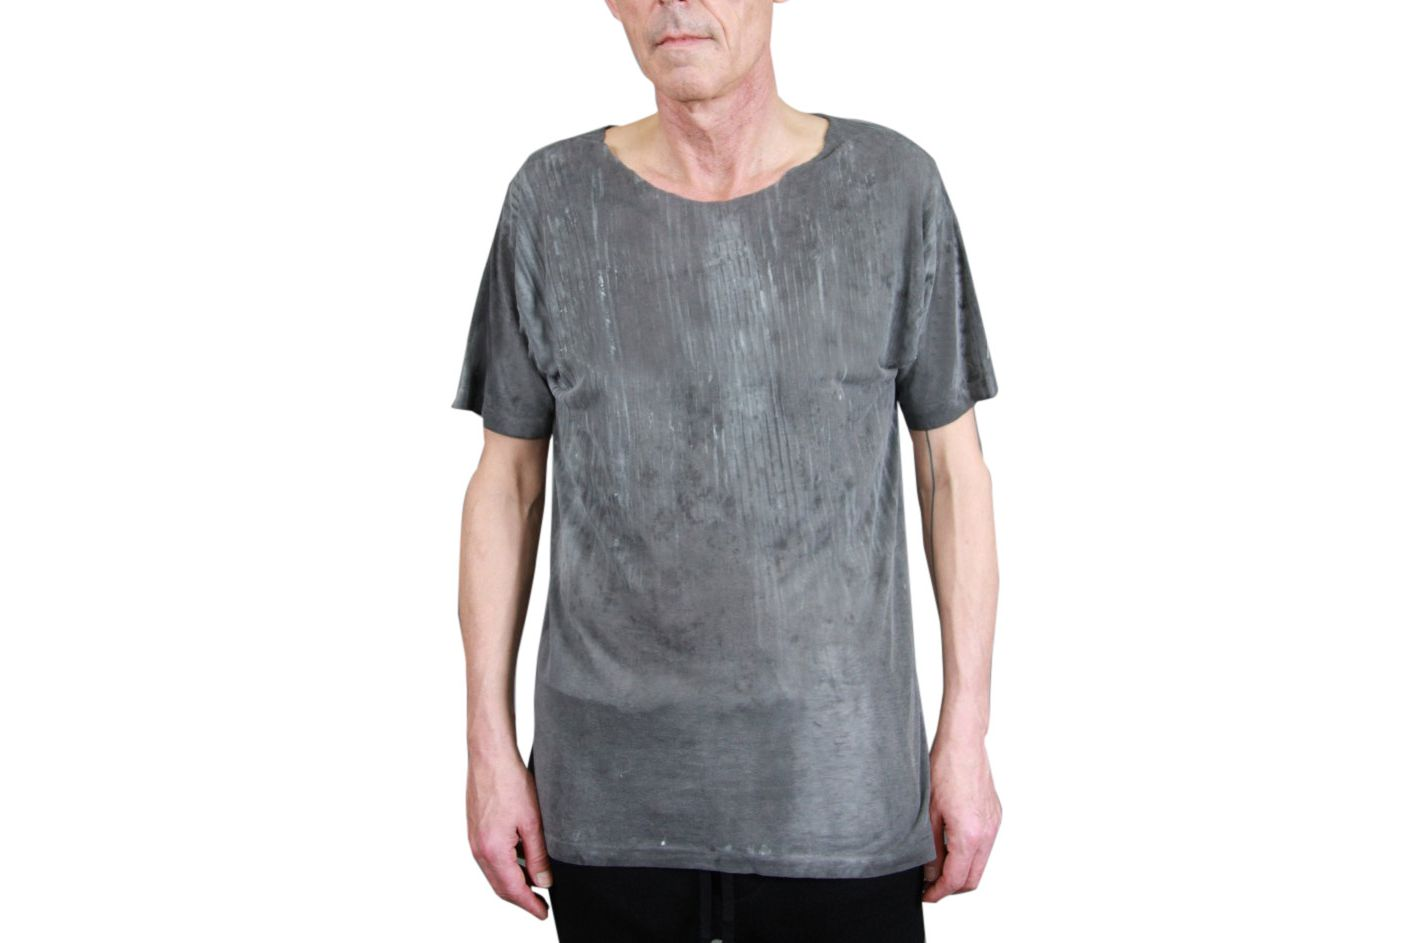 Amy Glenn Vintage Handpainted T-shirt